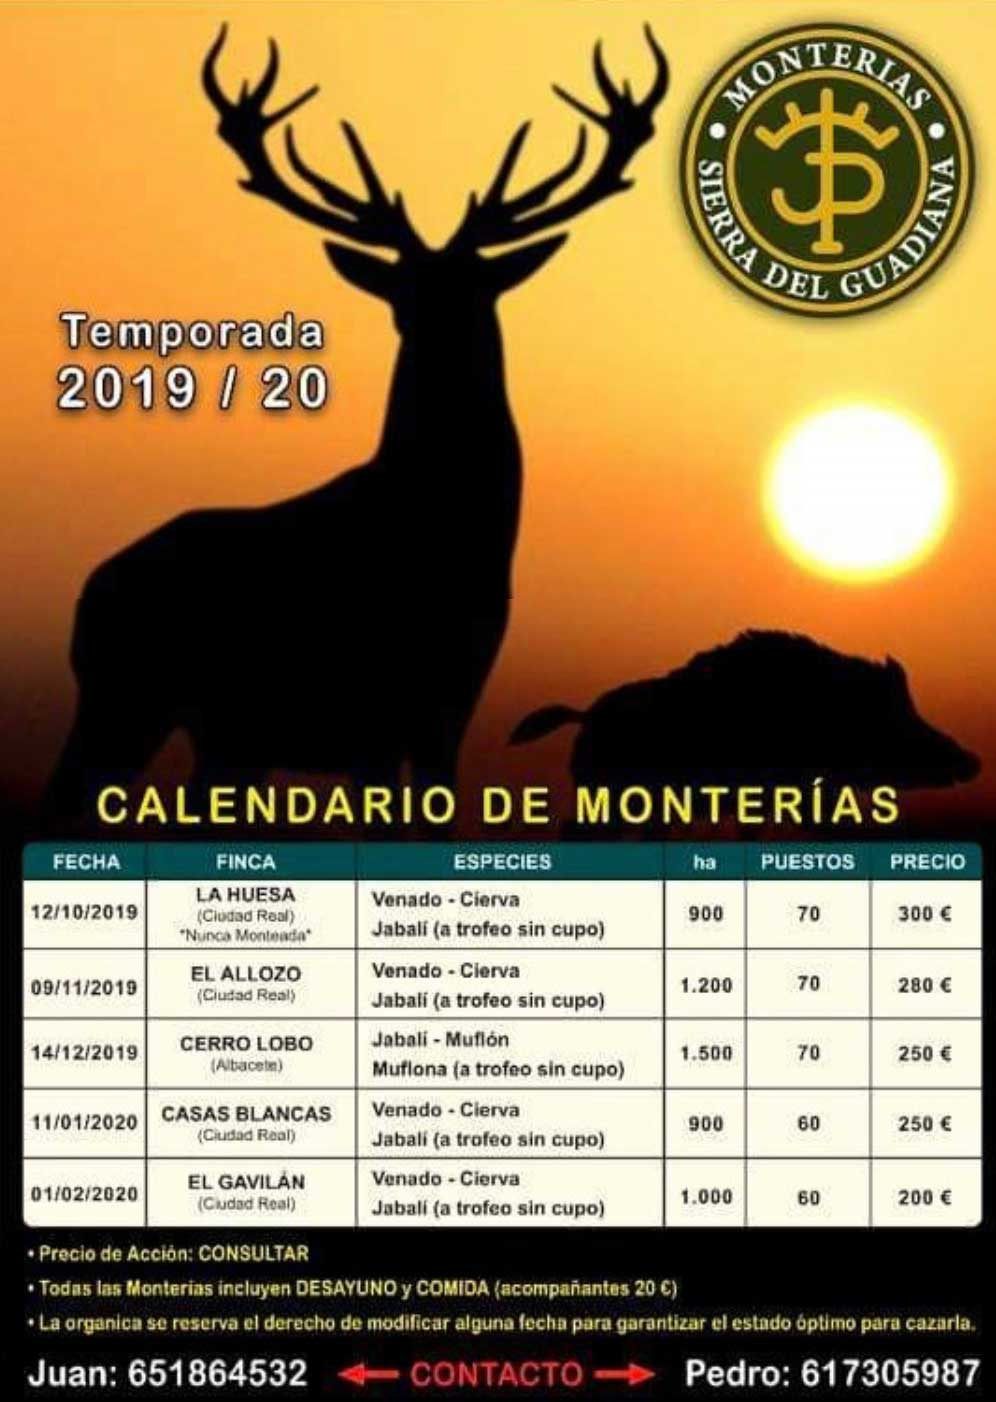 Programa Monterias Sierra del Guadiana